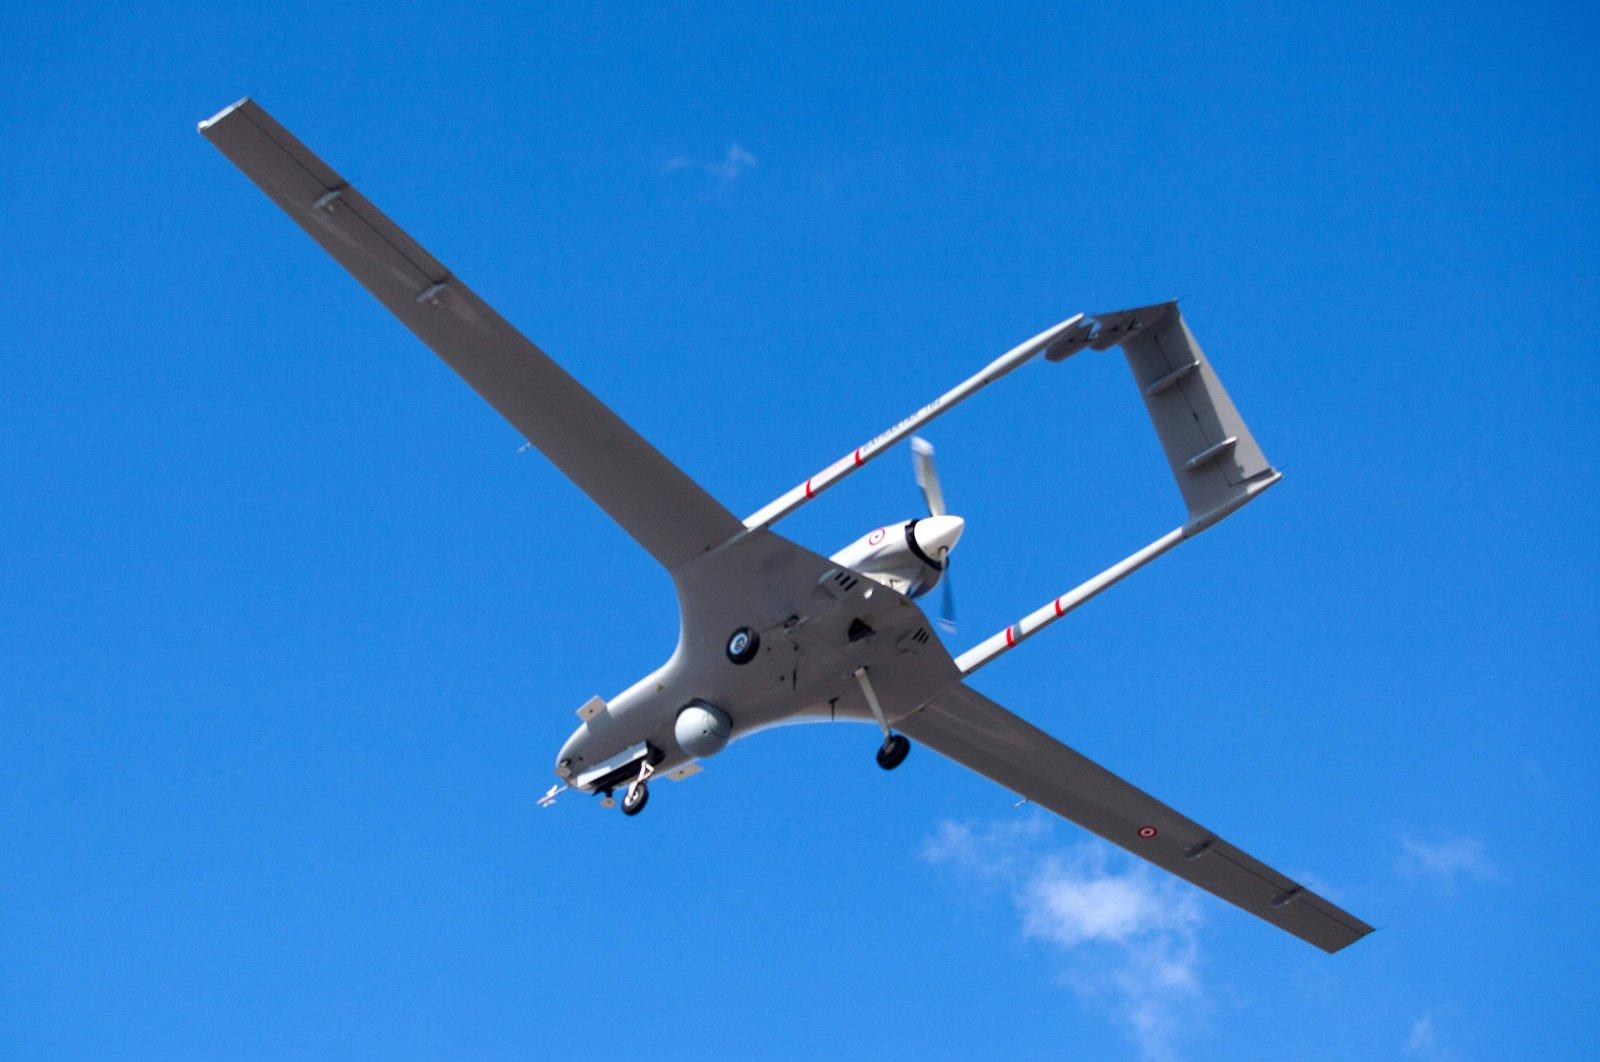 The Turkish-made Bayraktar TB2 drone flies at Geçitkale military airbase near Gazimağusa (Famagusta) in the Turkish Republic of Northern Cyprus (TRNC), Dec. 16, 2019. (AFP Photo)